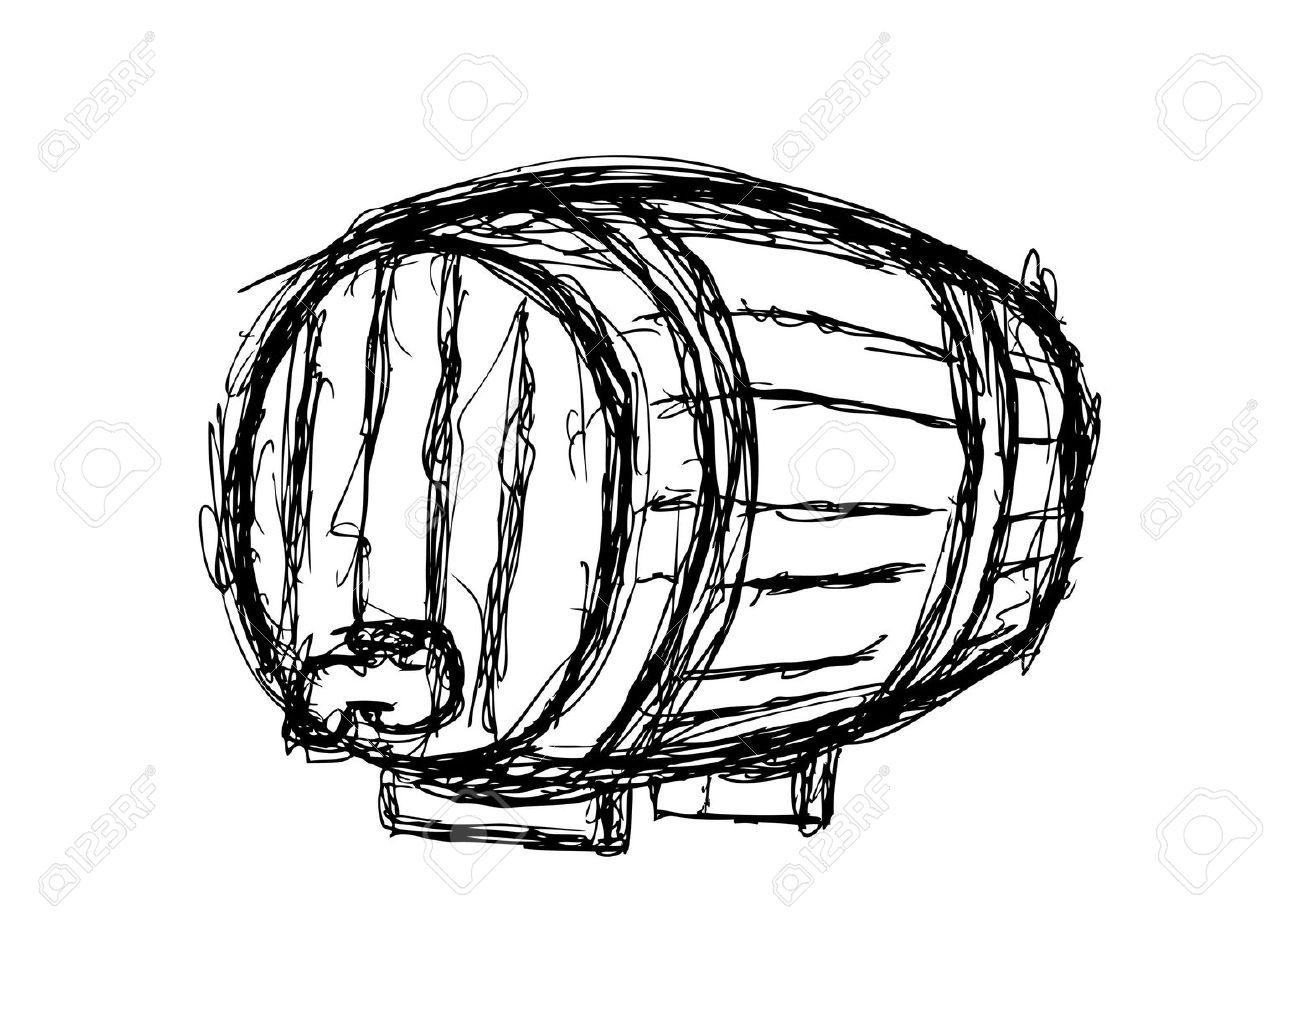 1300x1012 Whiskey Barrel Stock Photos Images, Royalty Free Whiskey Barrel